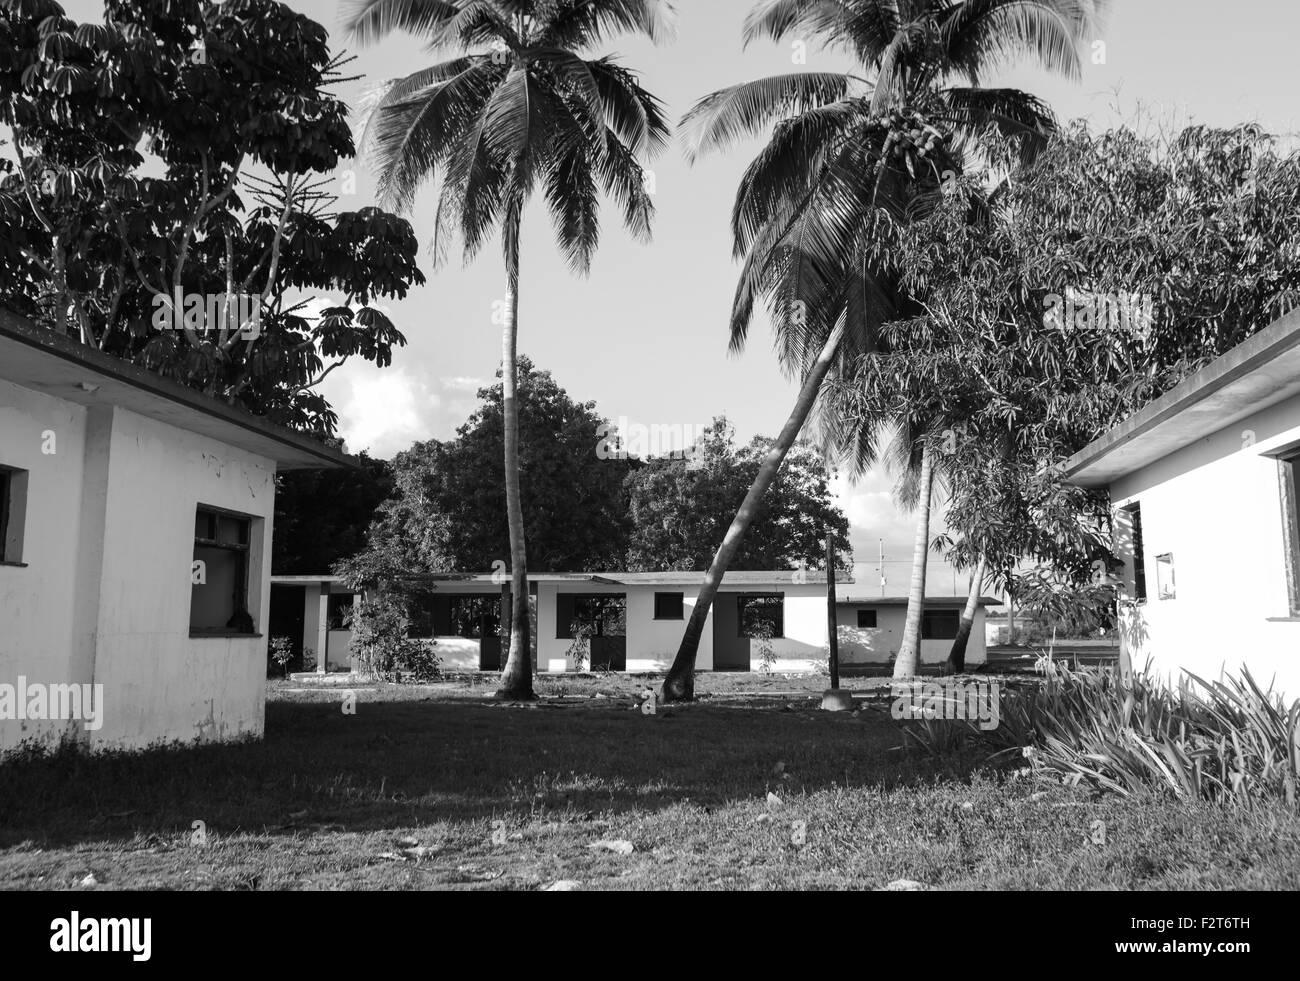 Deserted beach dwelling, Matanzas, Cuba - Stock Image